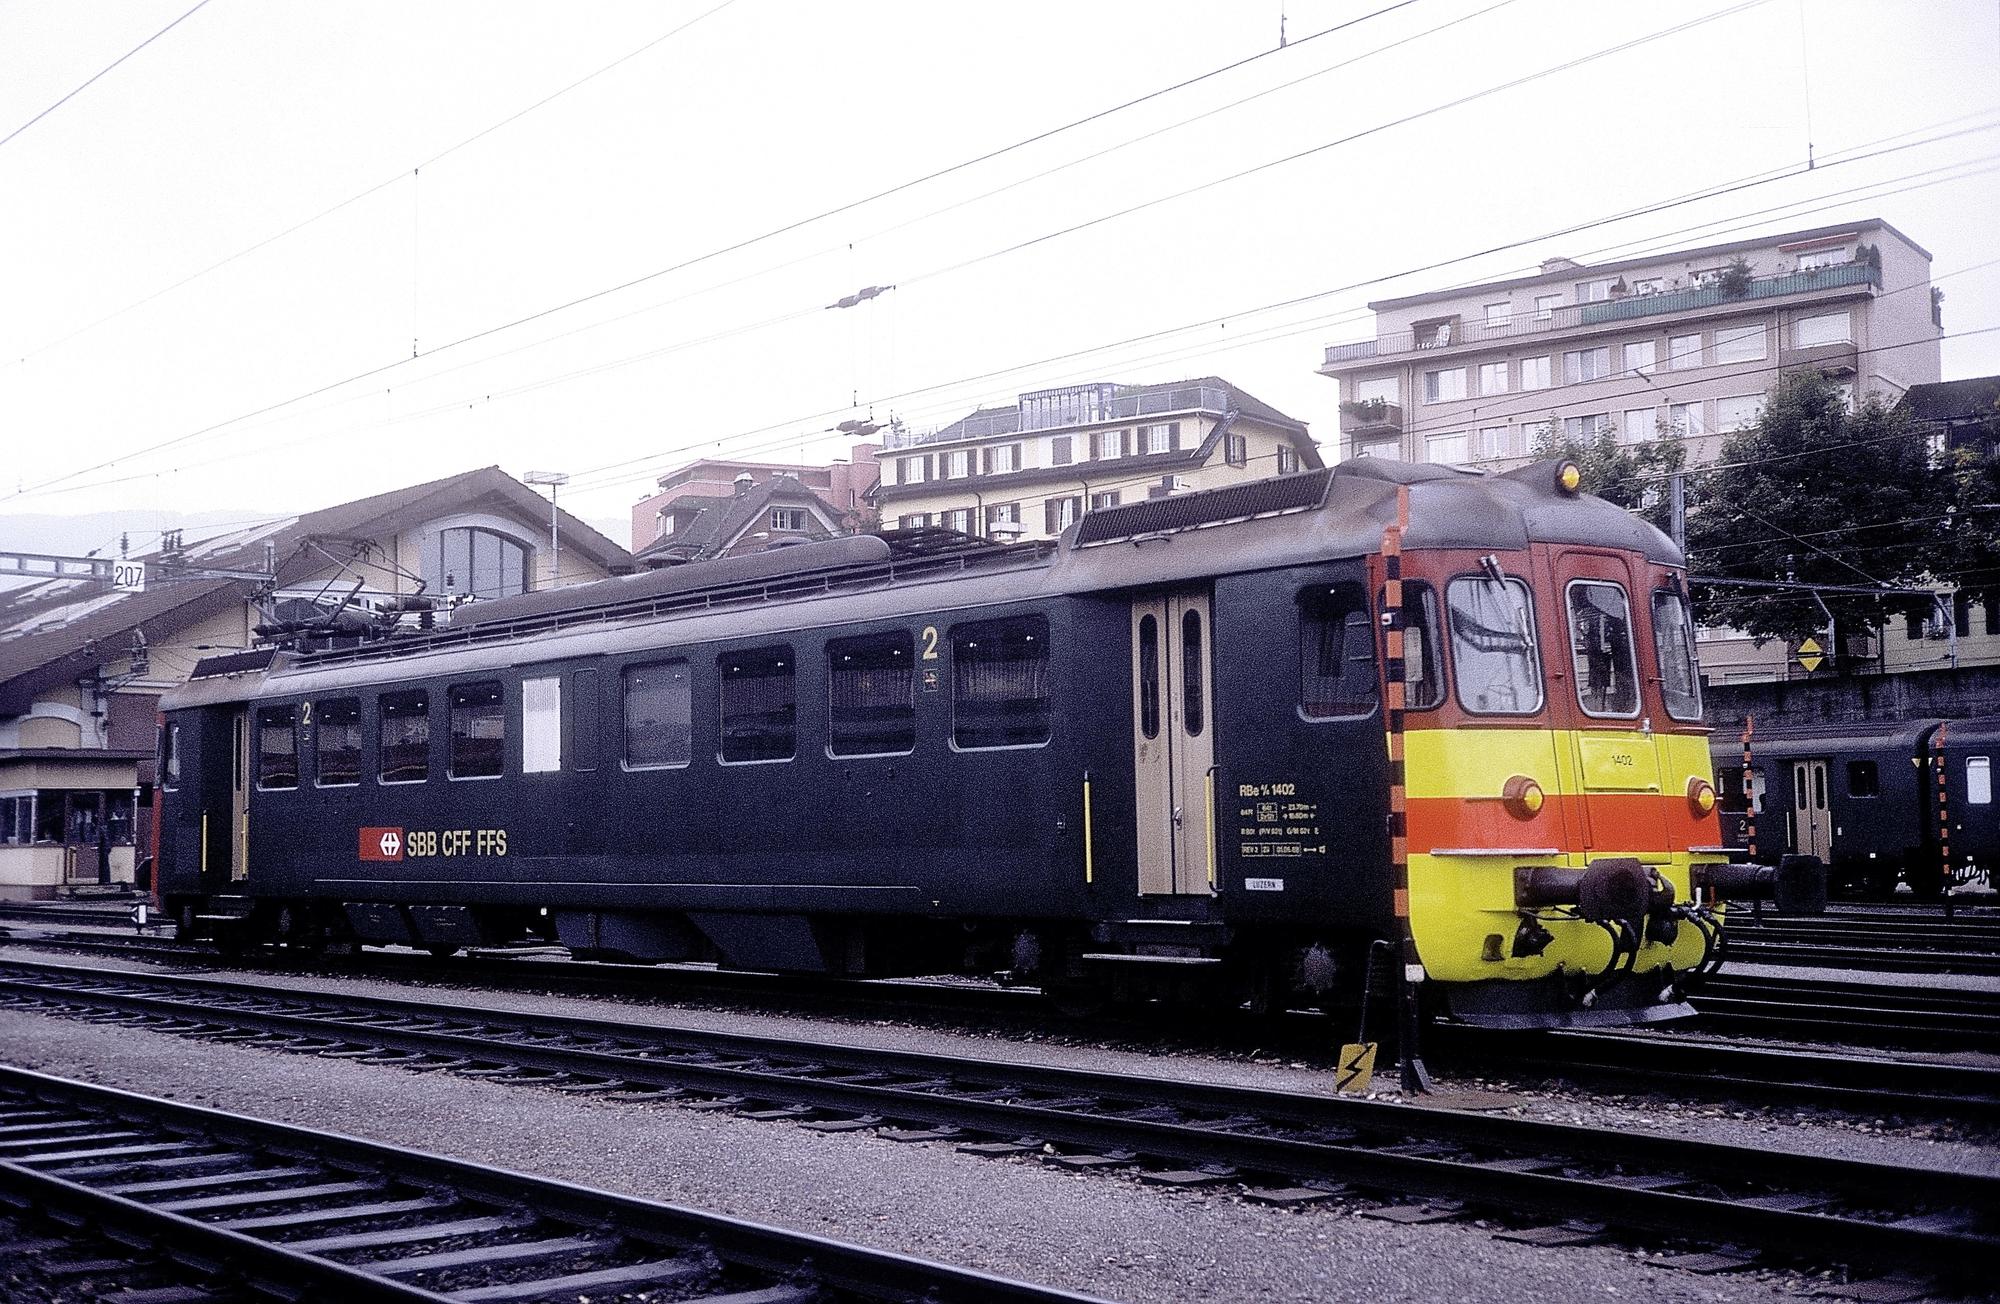 RBe 4/4 1402 in Luzern